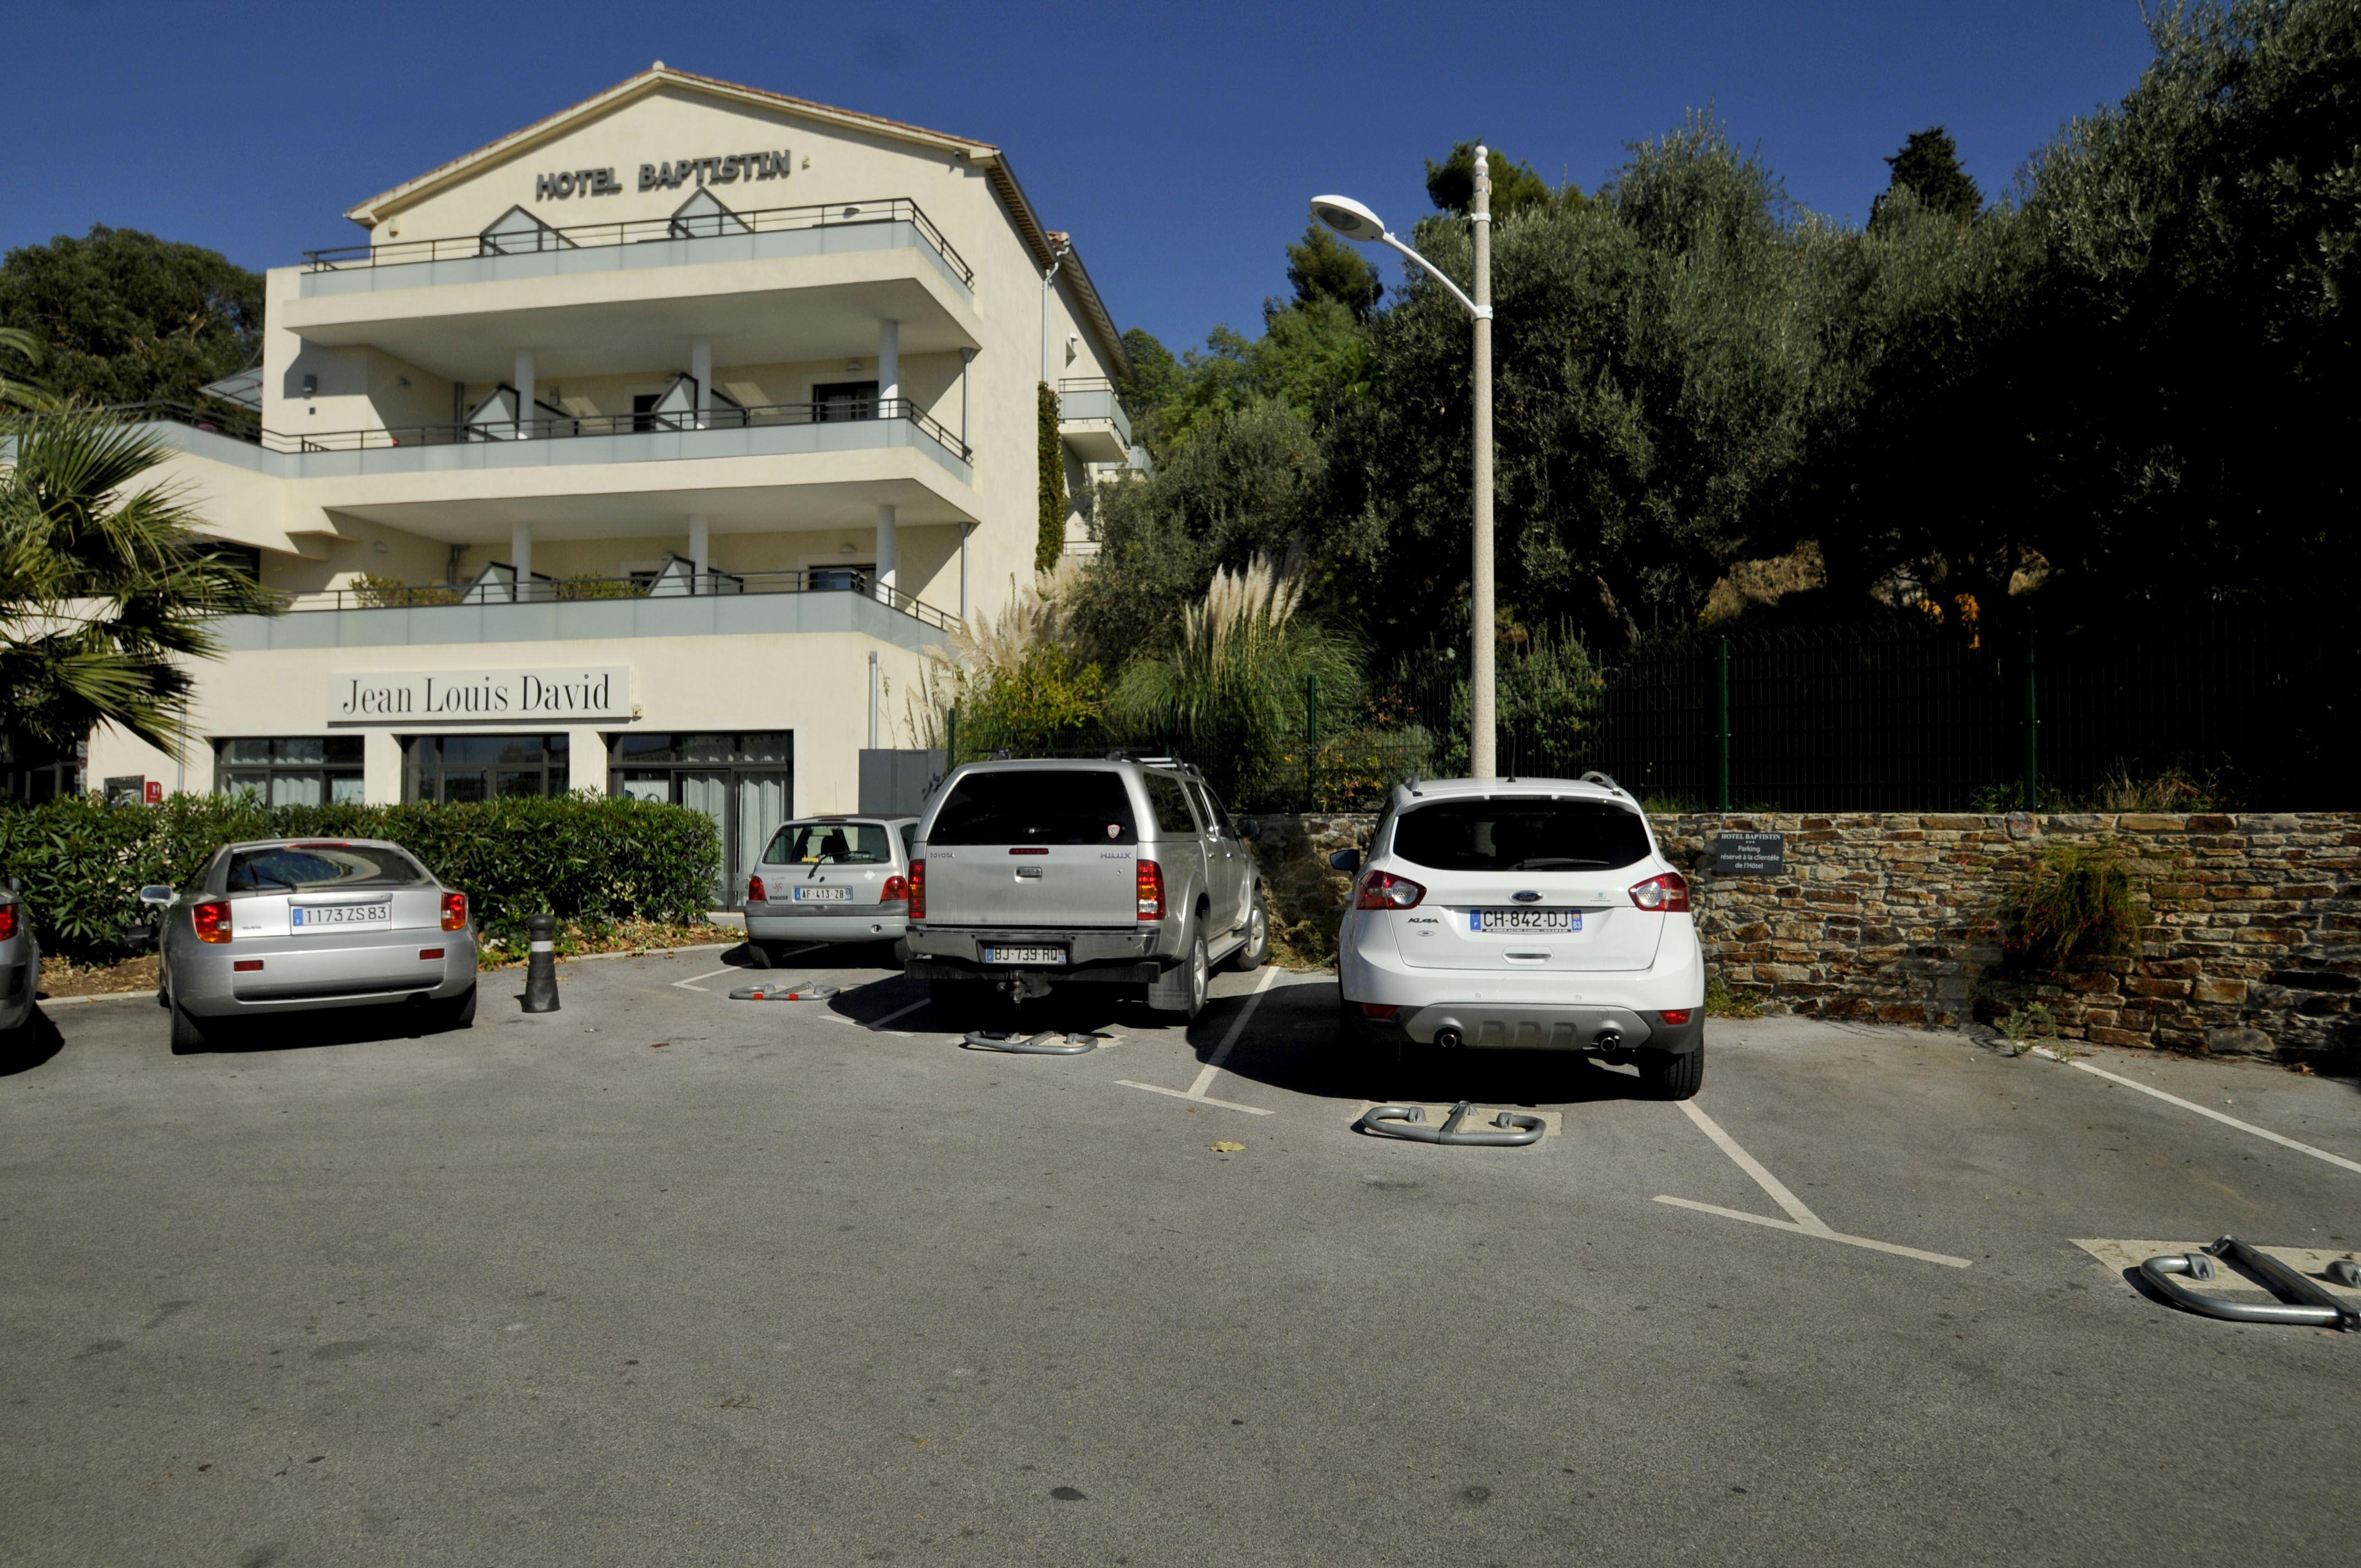 HOTEL BAPTISTIN